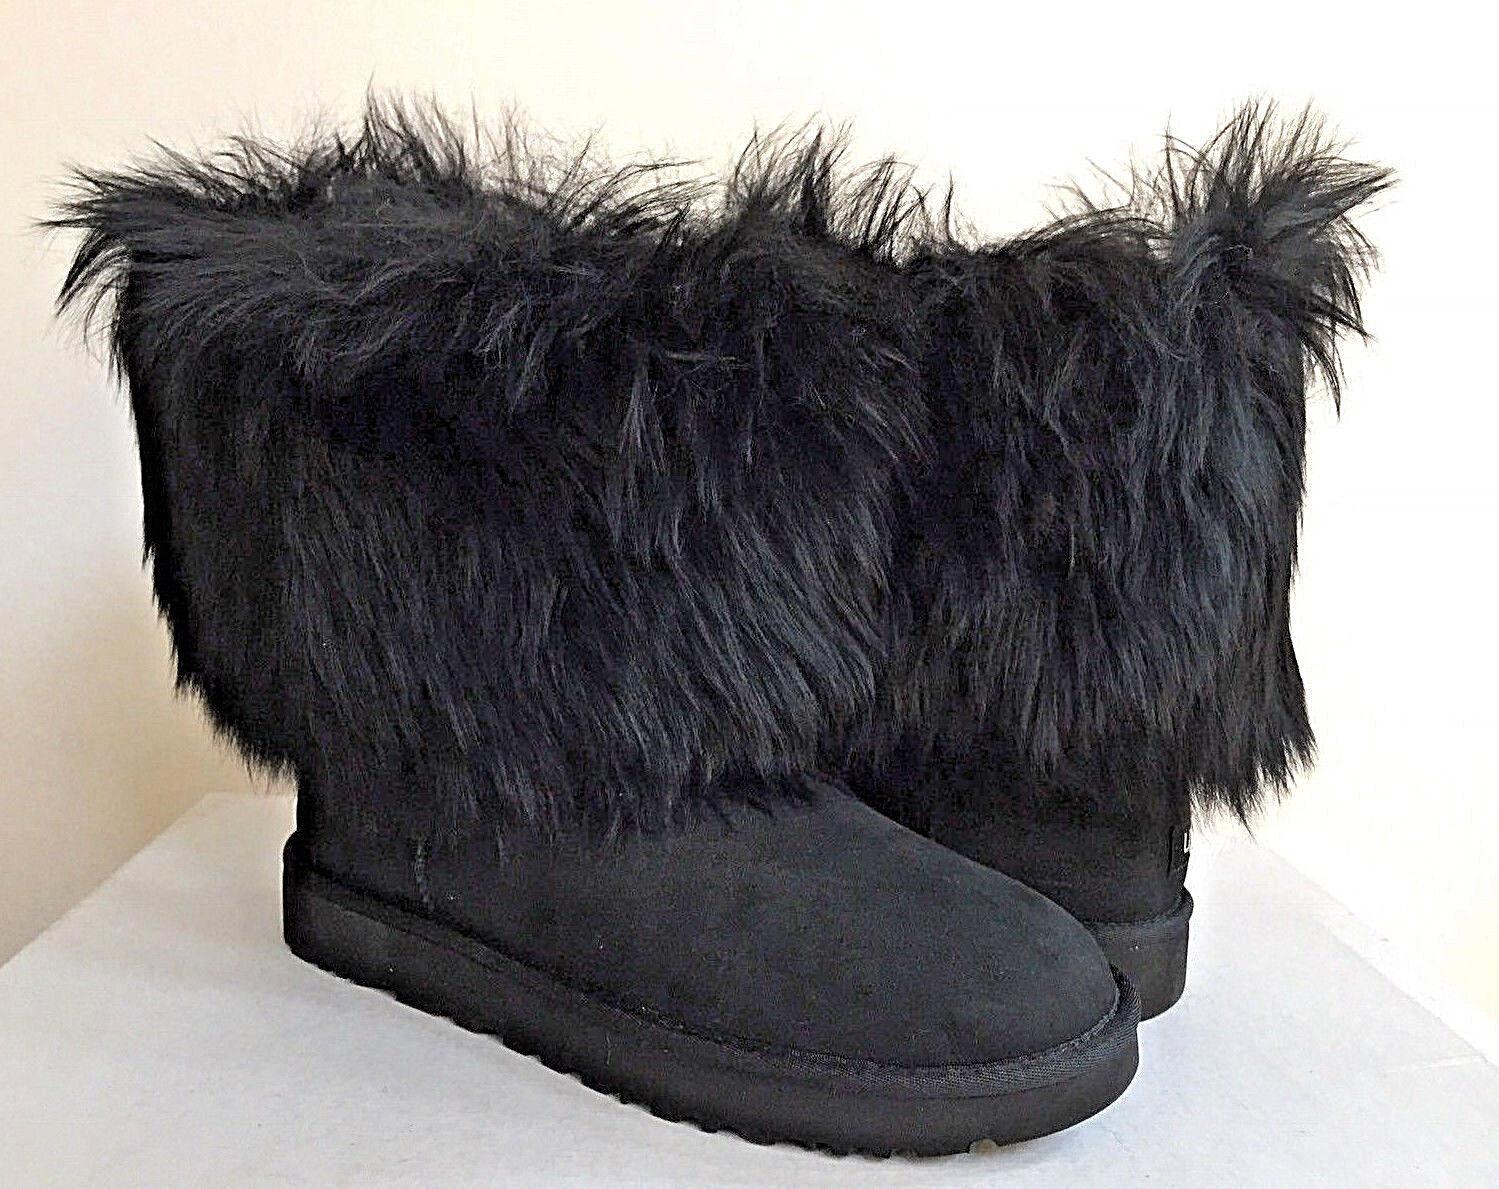 UGG CLASSIC RÖVID MONGOLIAN SHEEPSKIN CUFF BLACK BOOT US 9 / EU 40 / UK 7.5